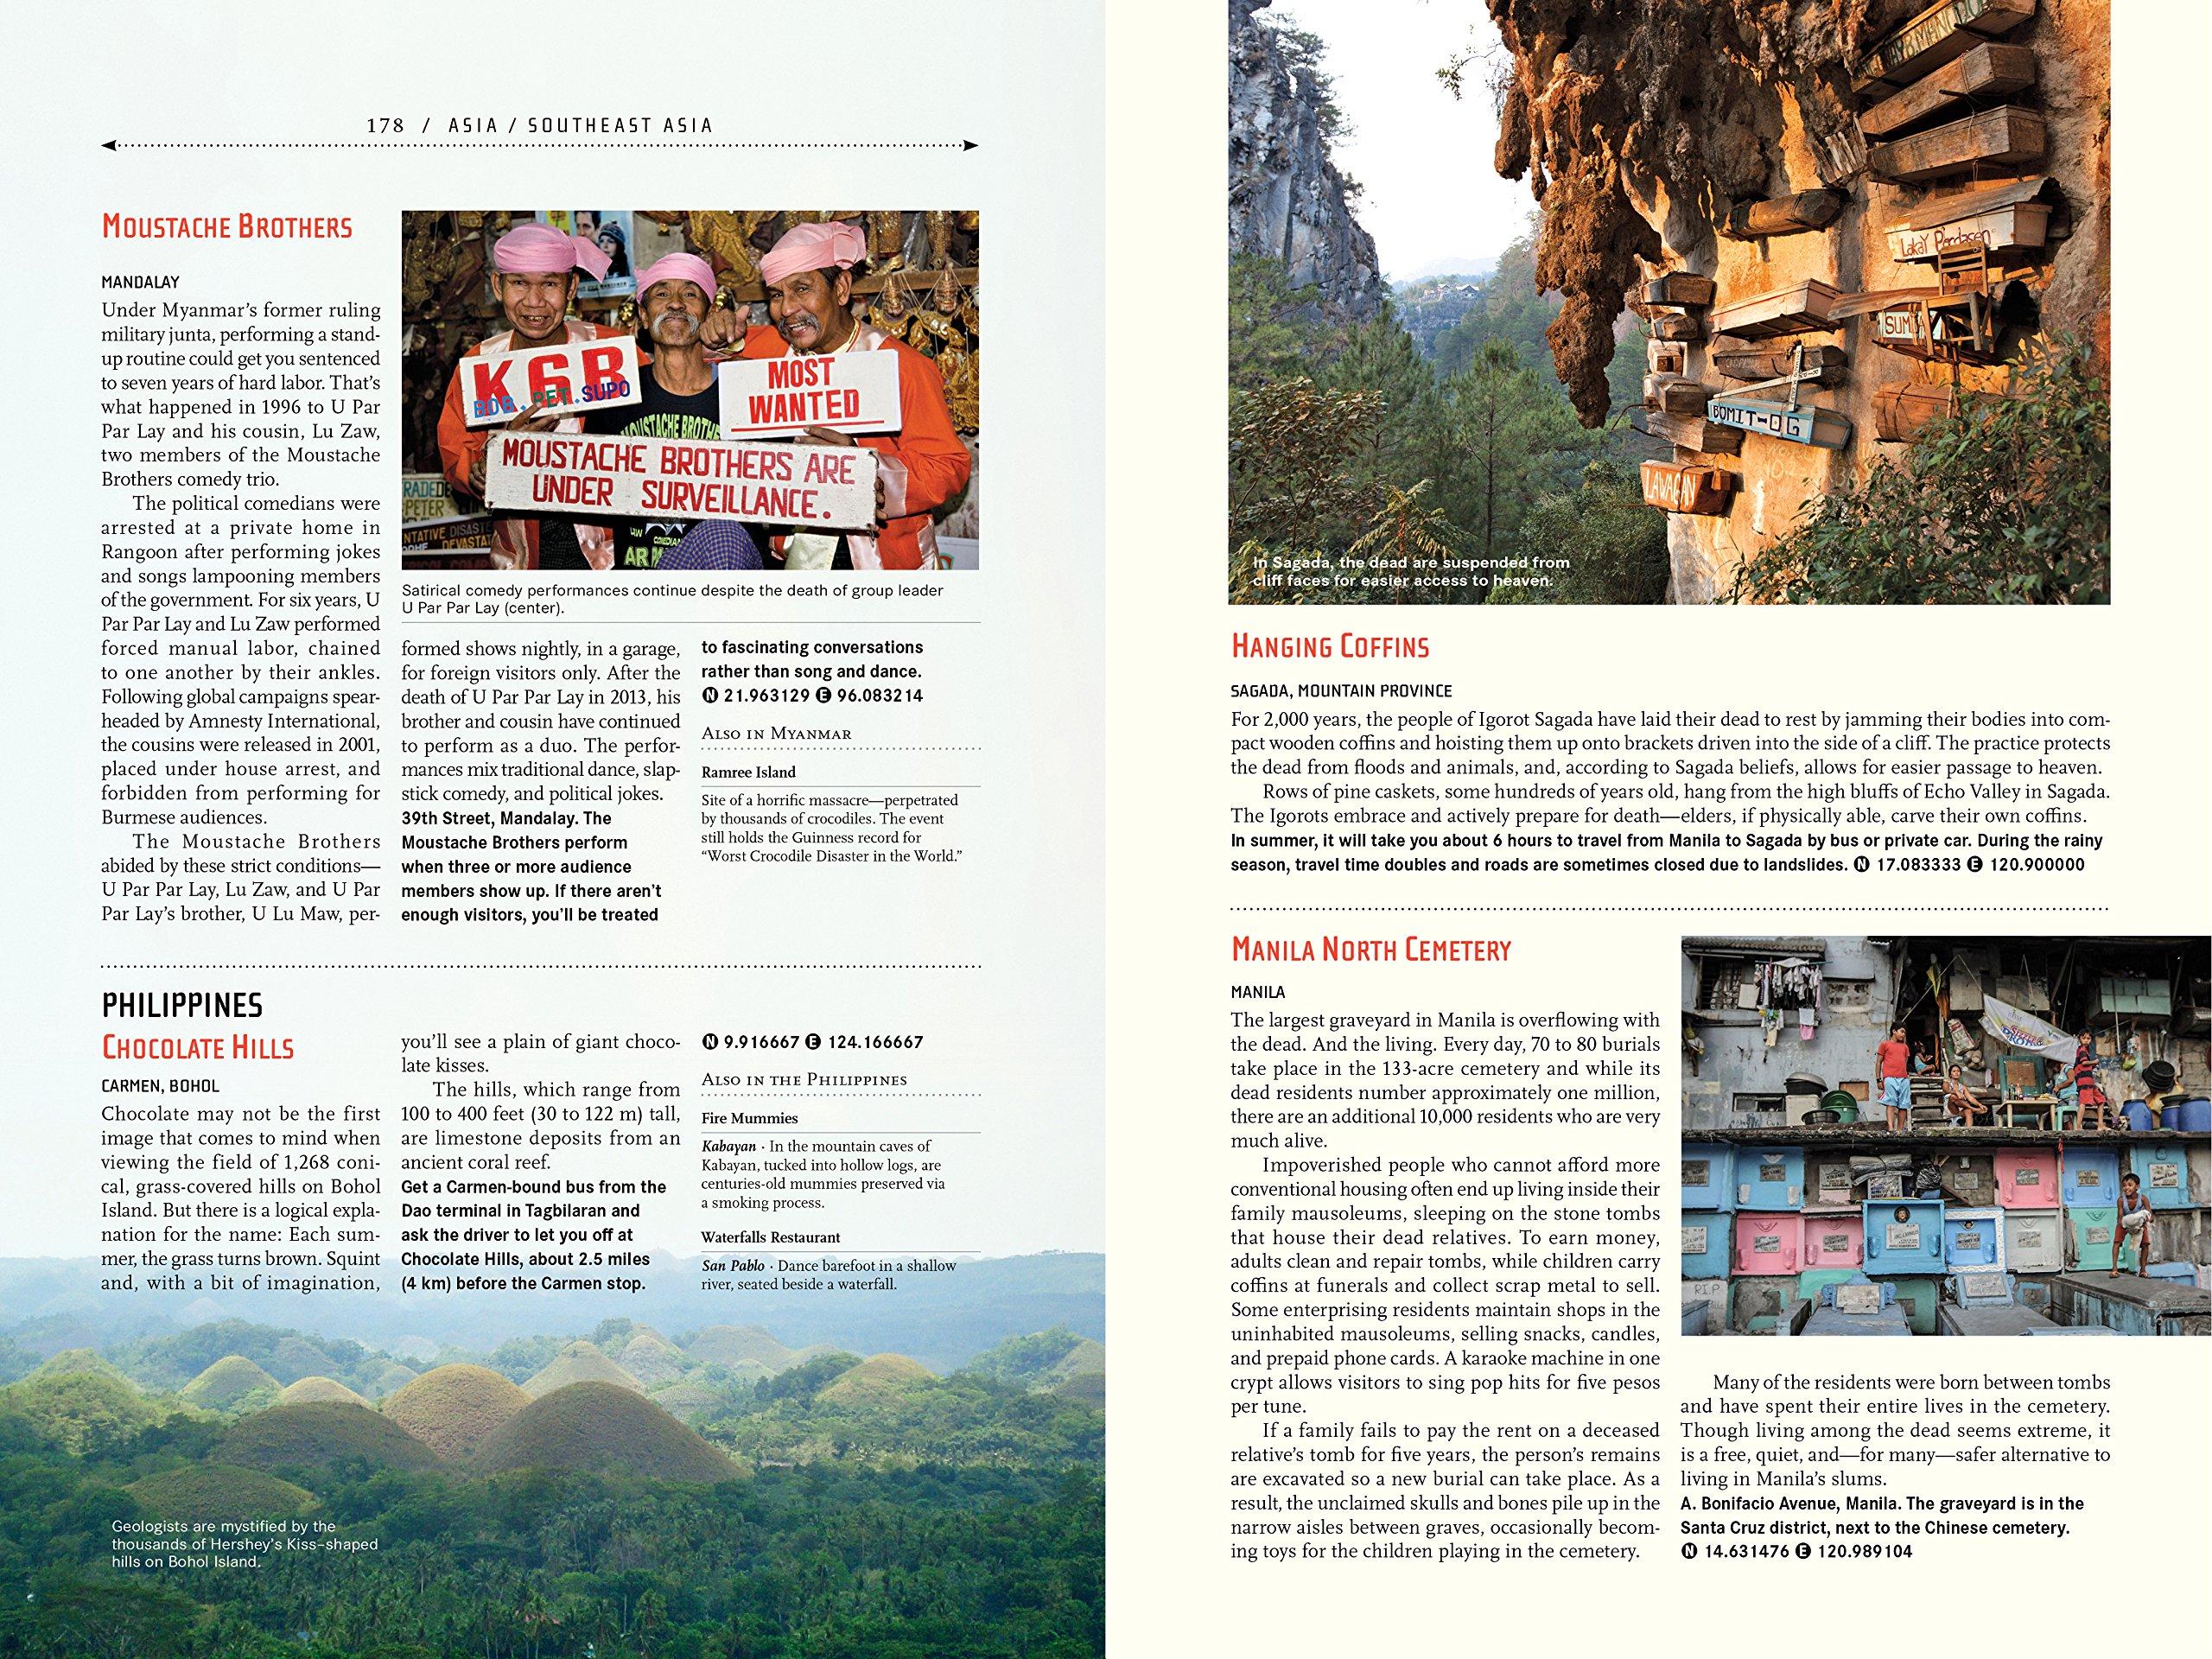 atlas obscura an explorer s guide to the world s hidden wonders rh amazon com explores guide llc explores guide llc